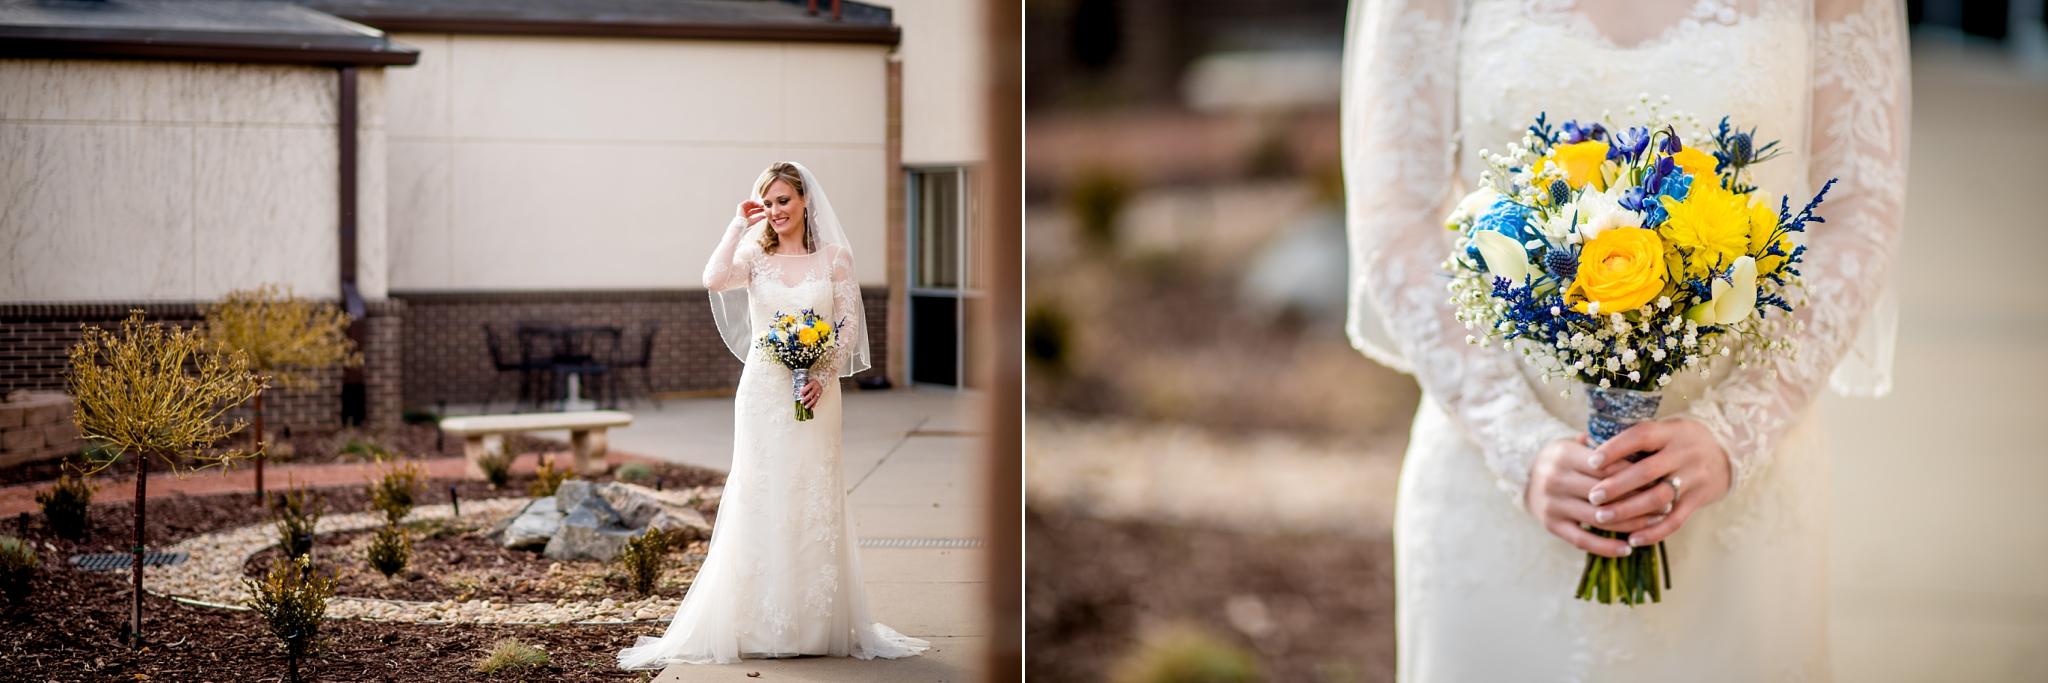 Chateaux at Fox Meadows Wedding_0011.jpg